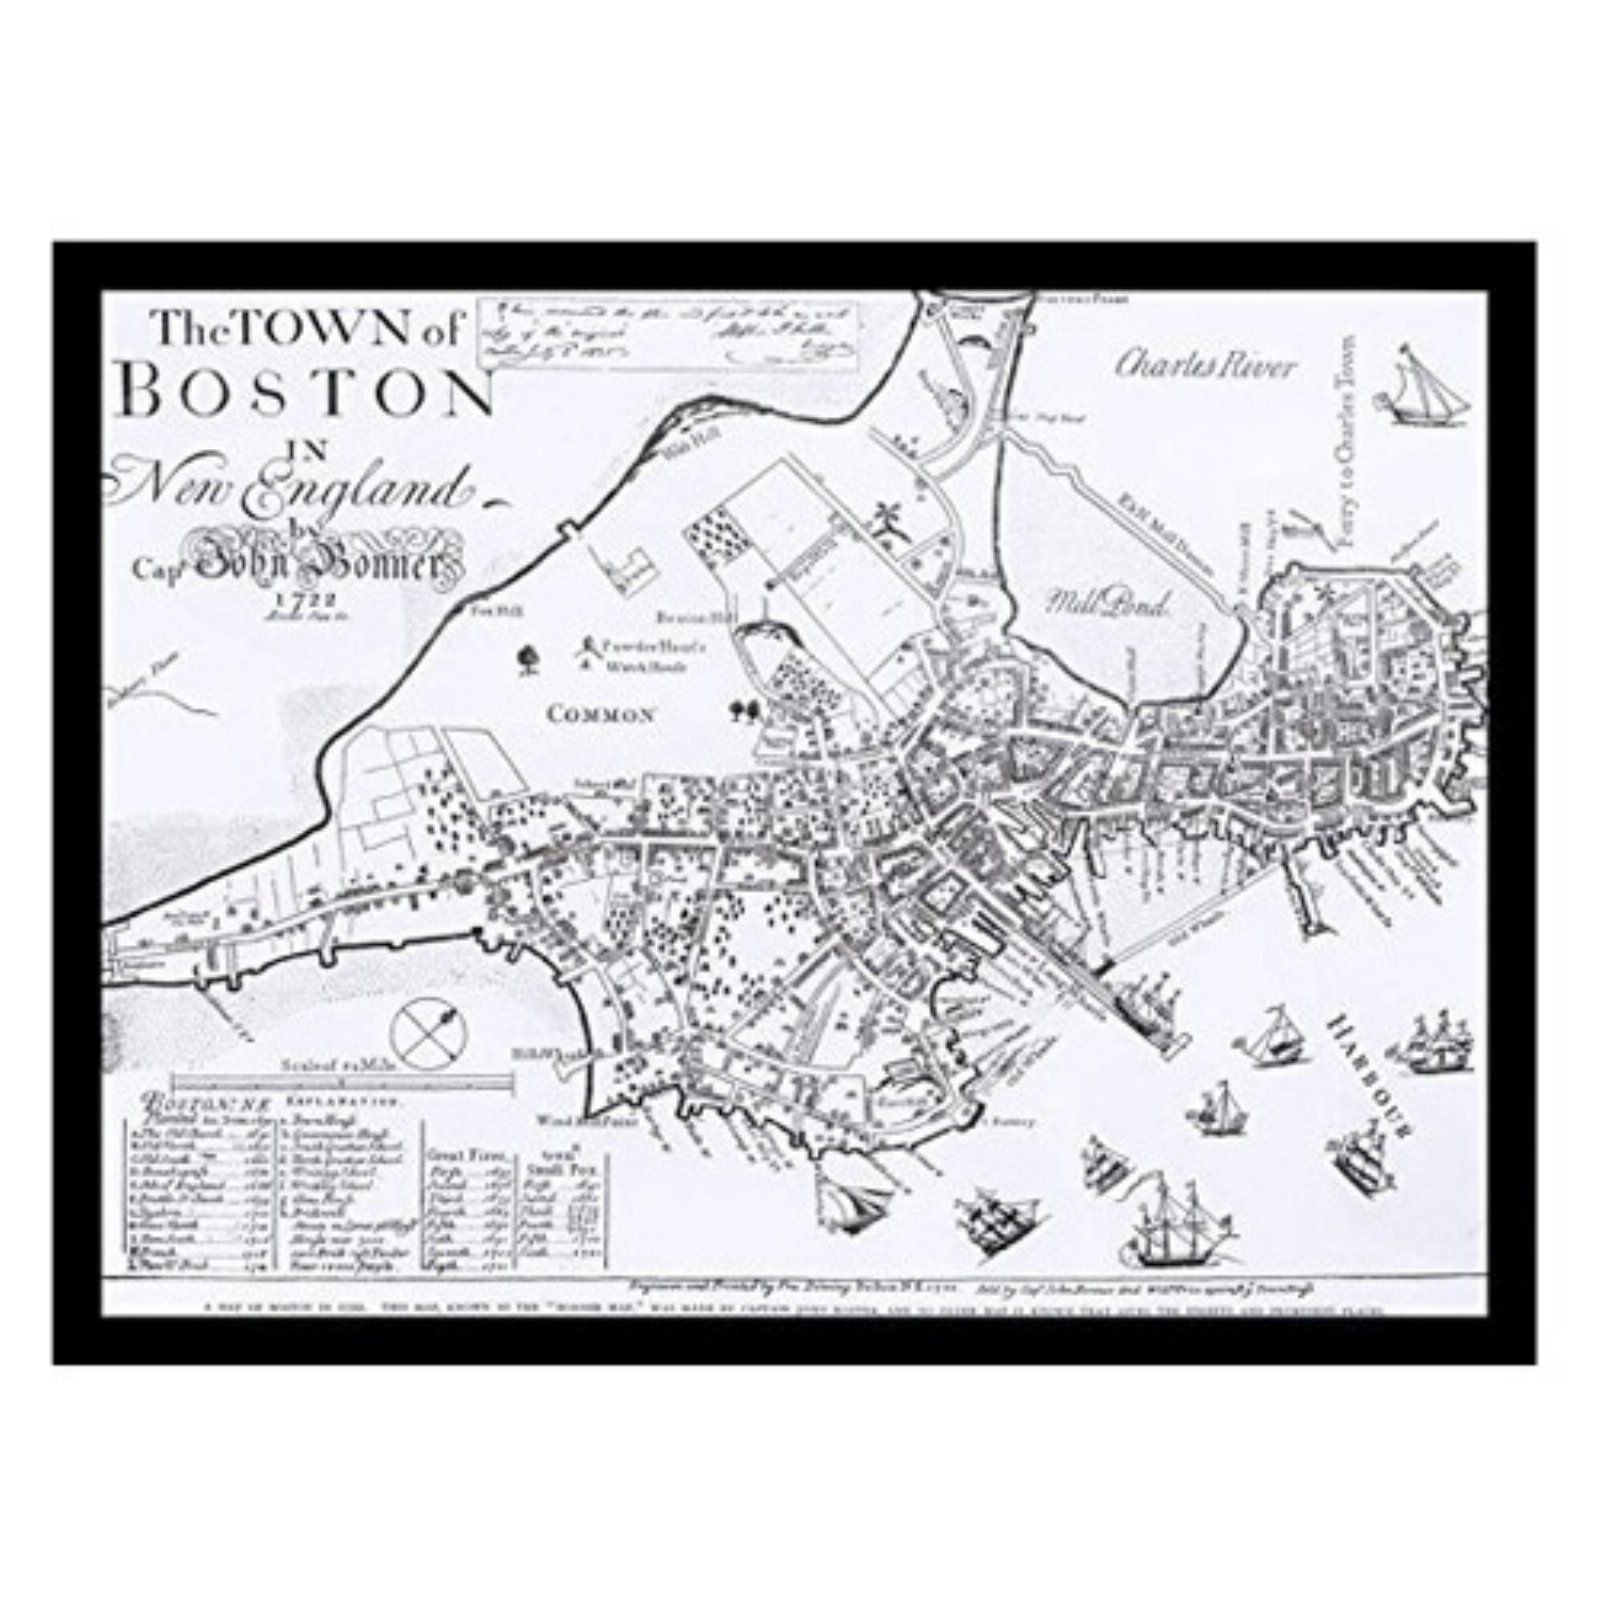 hight resolution of buyartforless map of boston 1722 framed art print poster